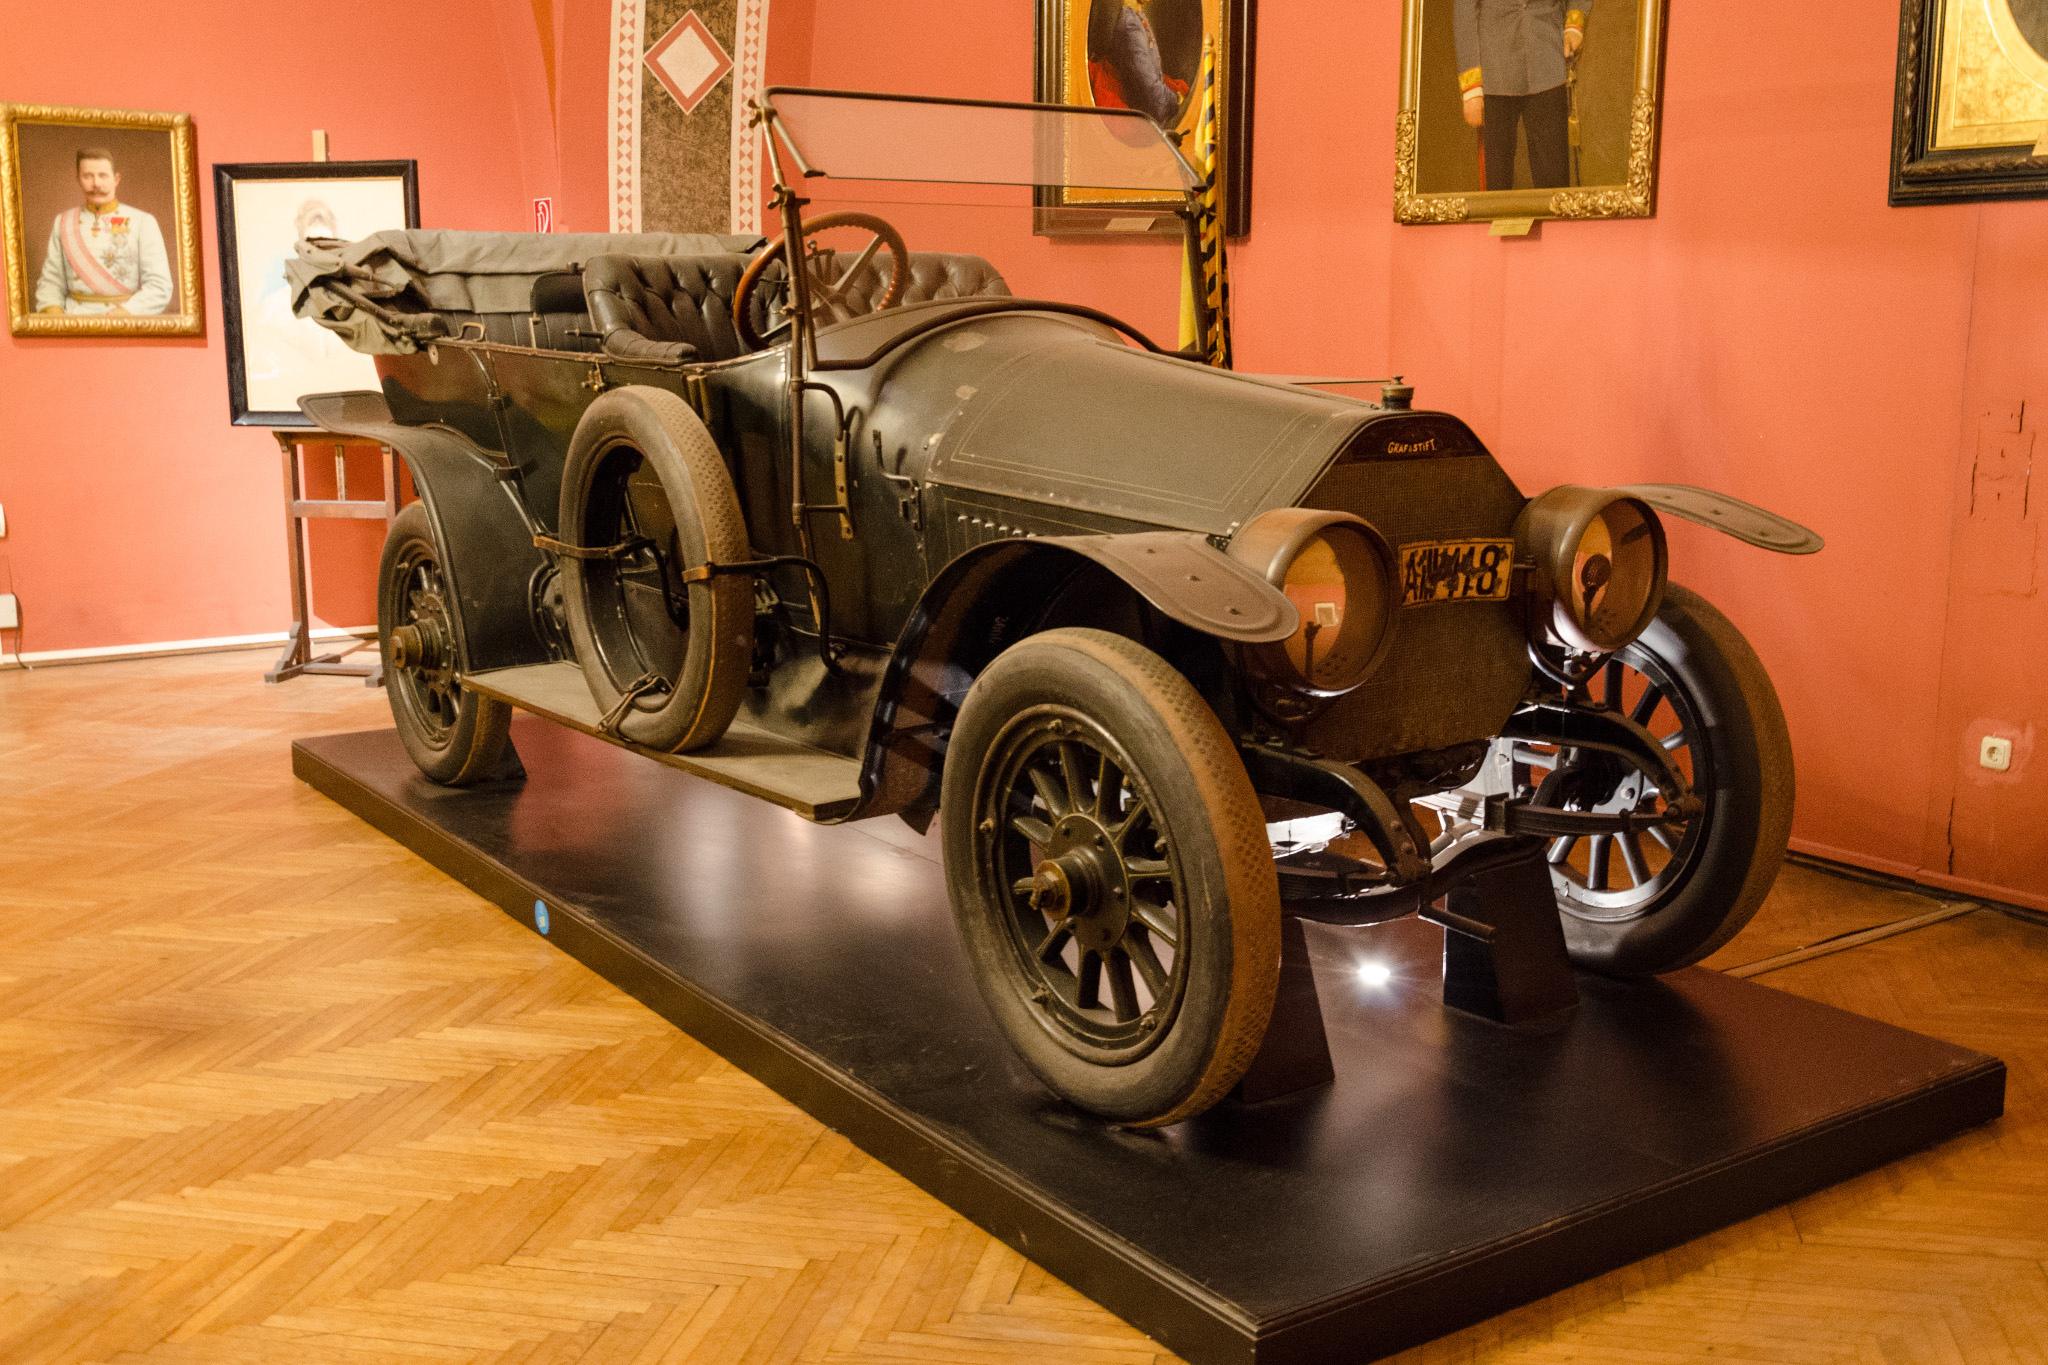 20 de fapte istorice greu de crezut, Masina ducelui Franz Ferdinand, Sursa: Hemmings Motor News